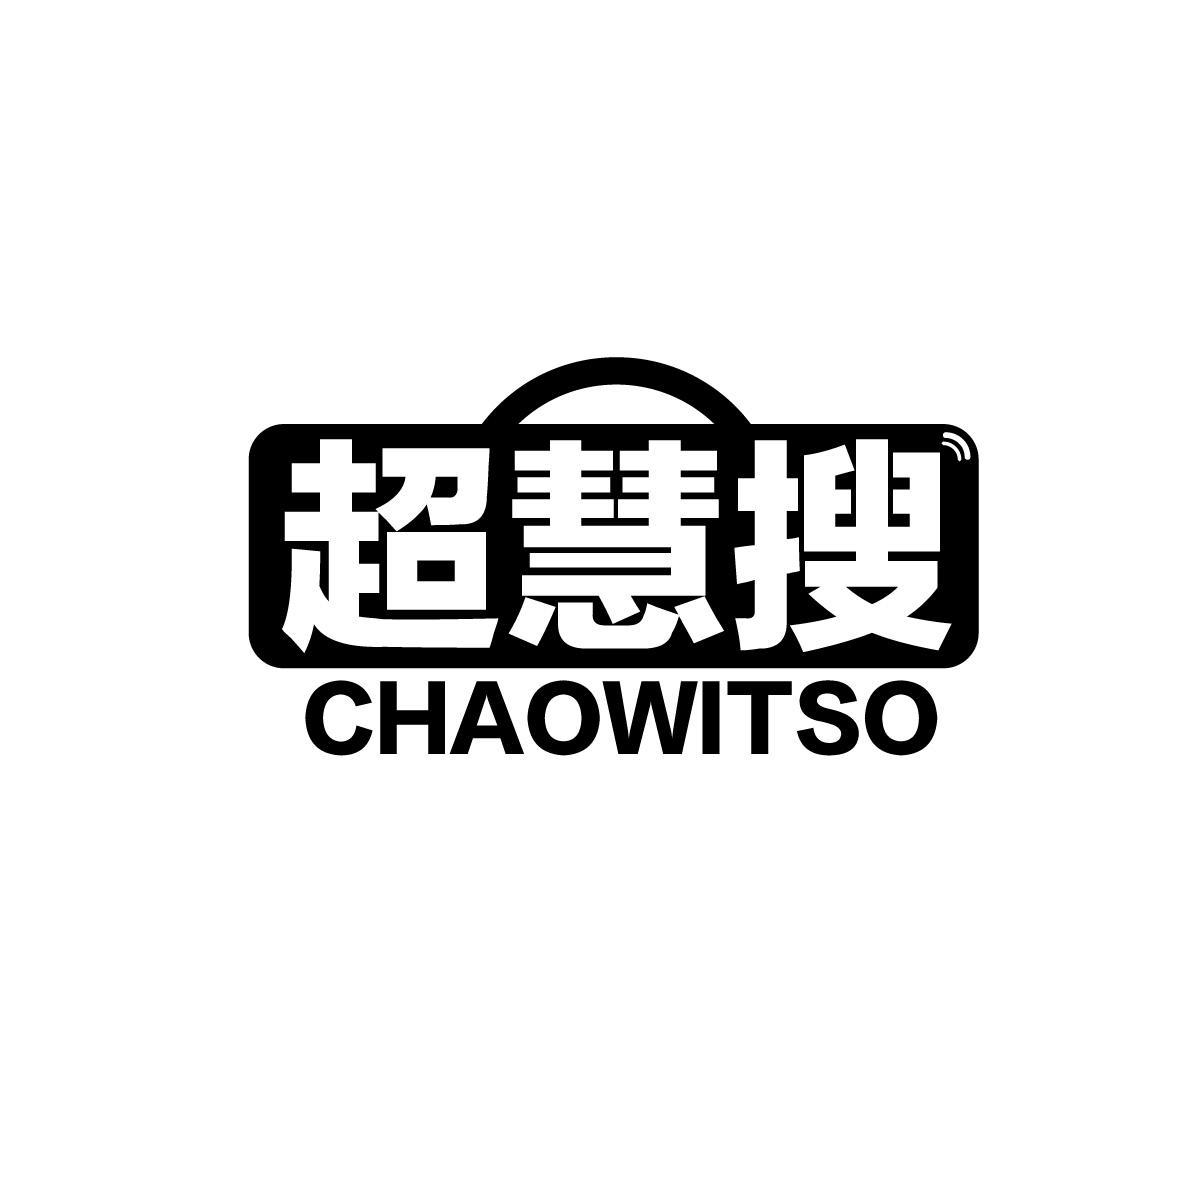 转让商标-超慧搜 CHAOWITSO